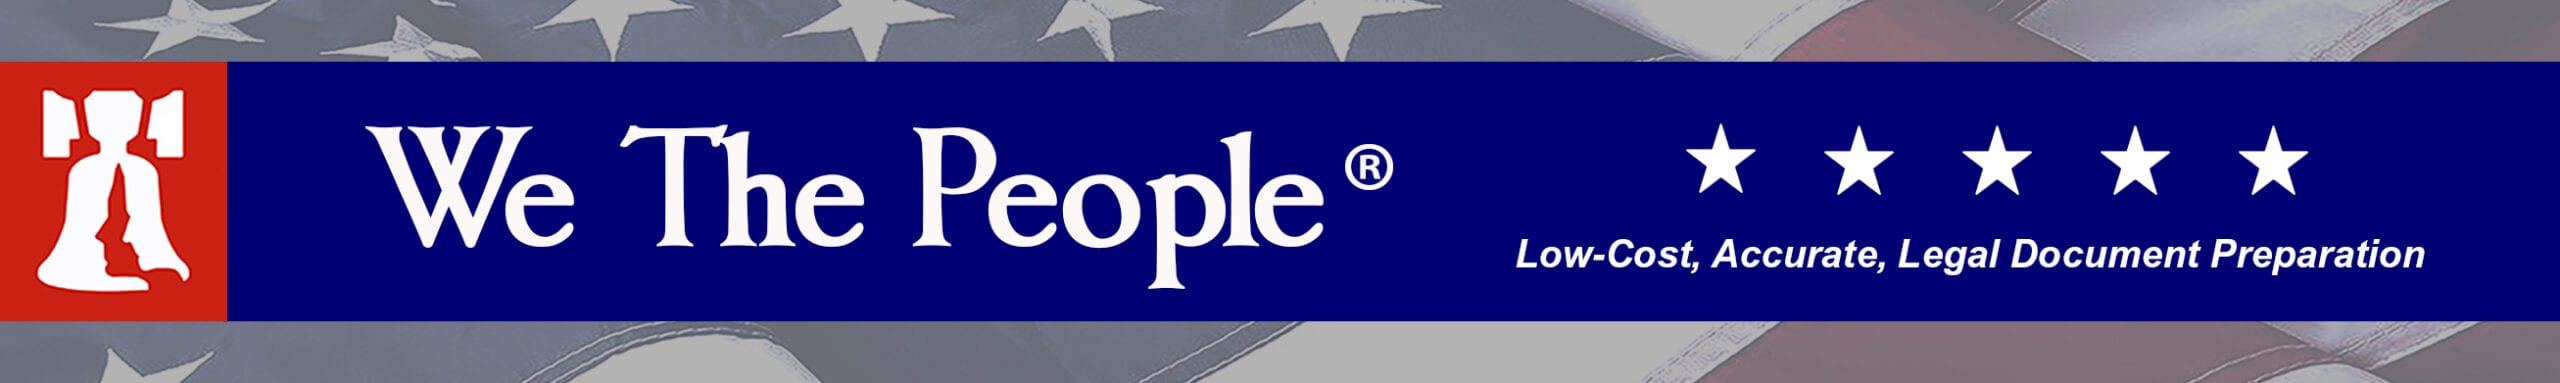 We The People USA